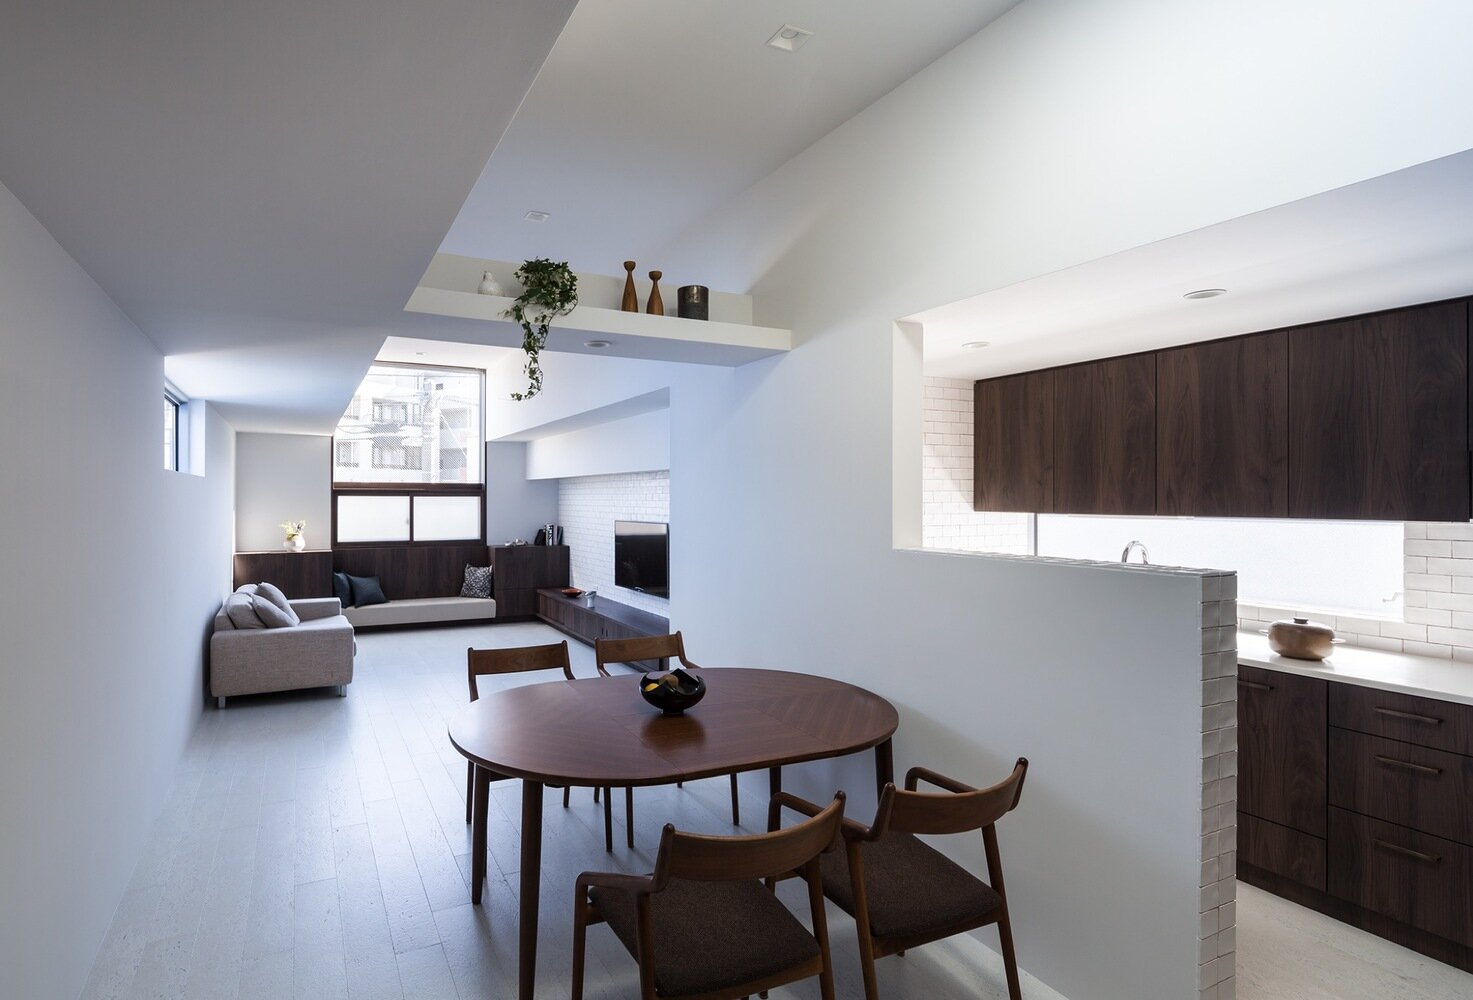 Adorable House - FORM Kouichi Kimura Architects - Japan - Living Room - Humble Homes